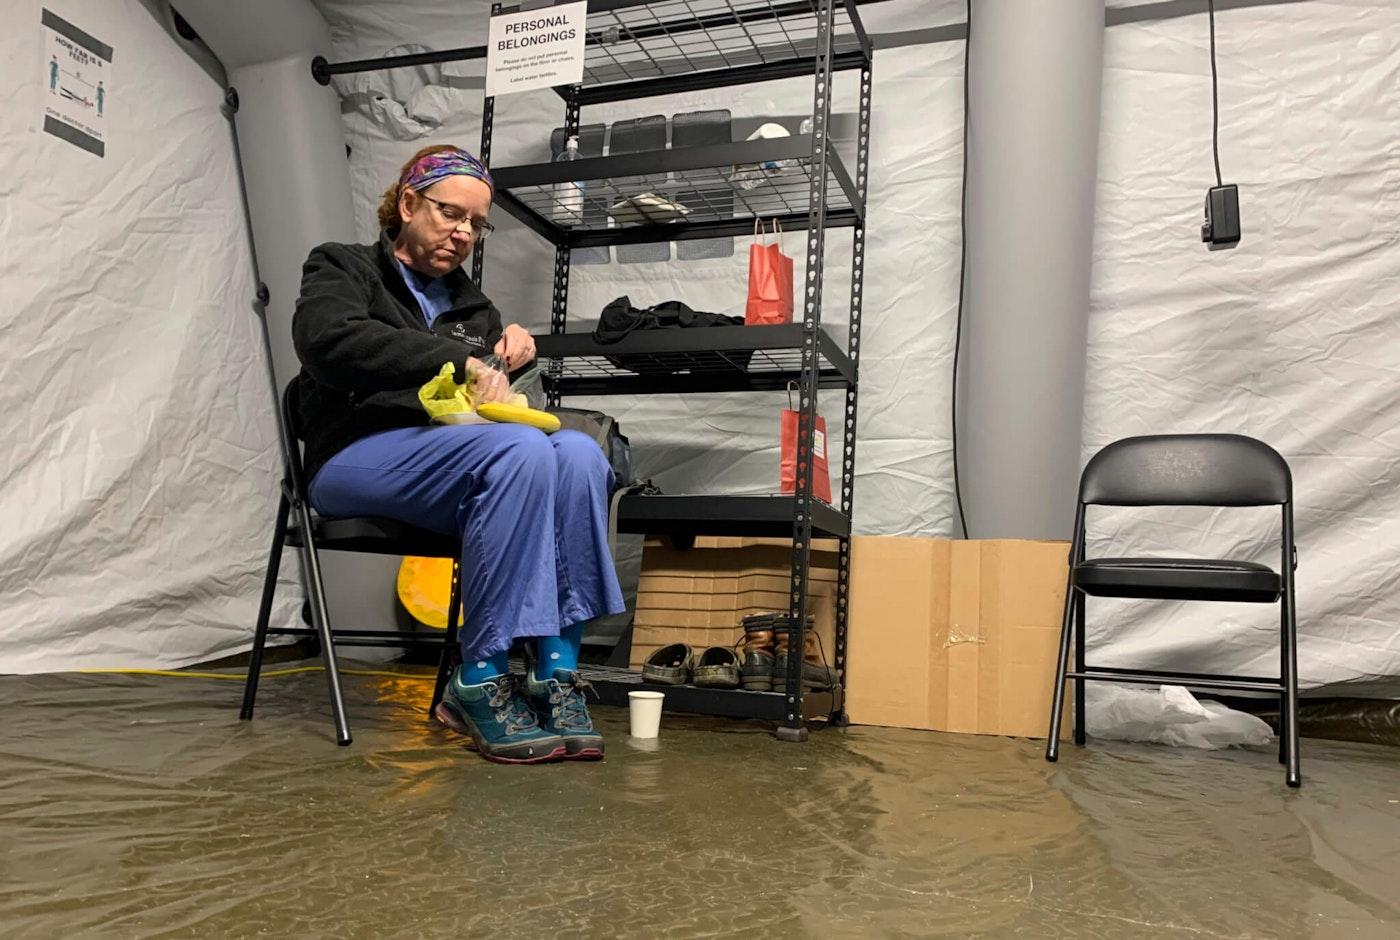 Chris Rutledge, a nurse for Samaritan's Purse, eats lunch in January 2021 during the only short break of her 12-hour shift inside the COVID-19 field hospital in Lenoir, N.C. (AP Photo/Sarah Blake Morgan)